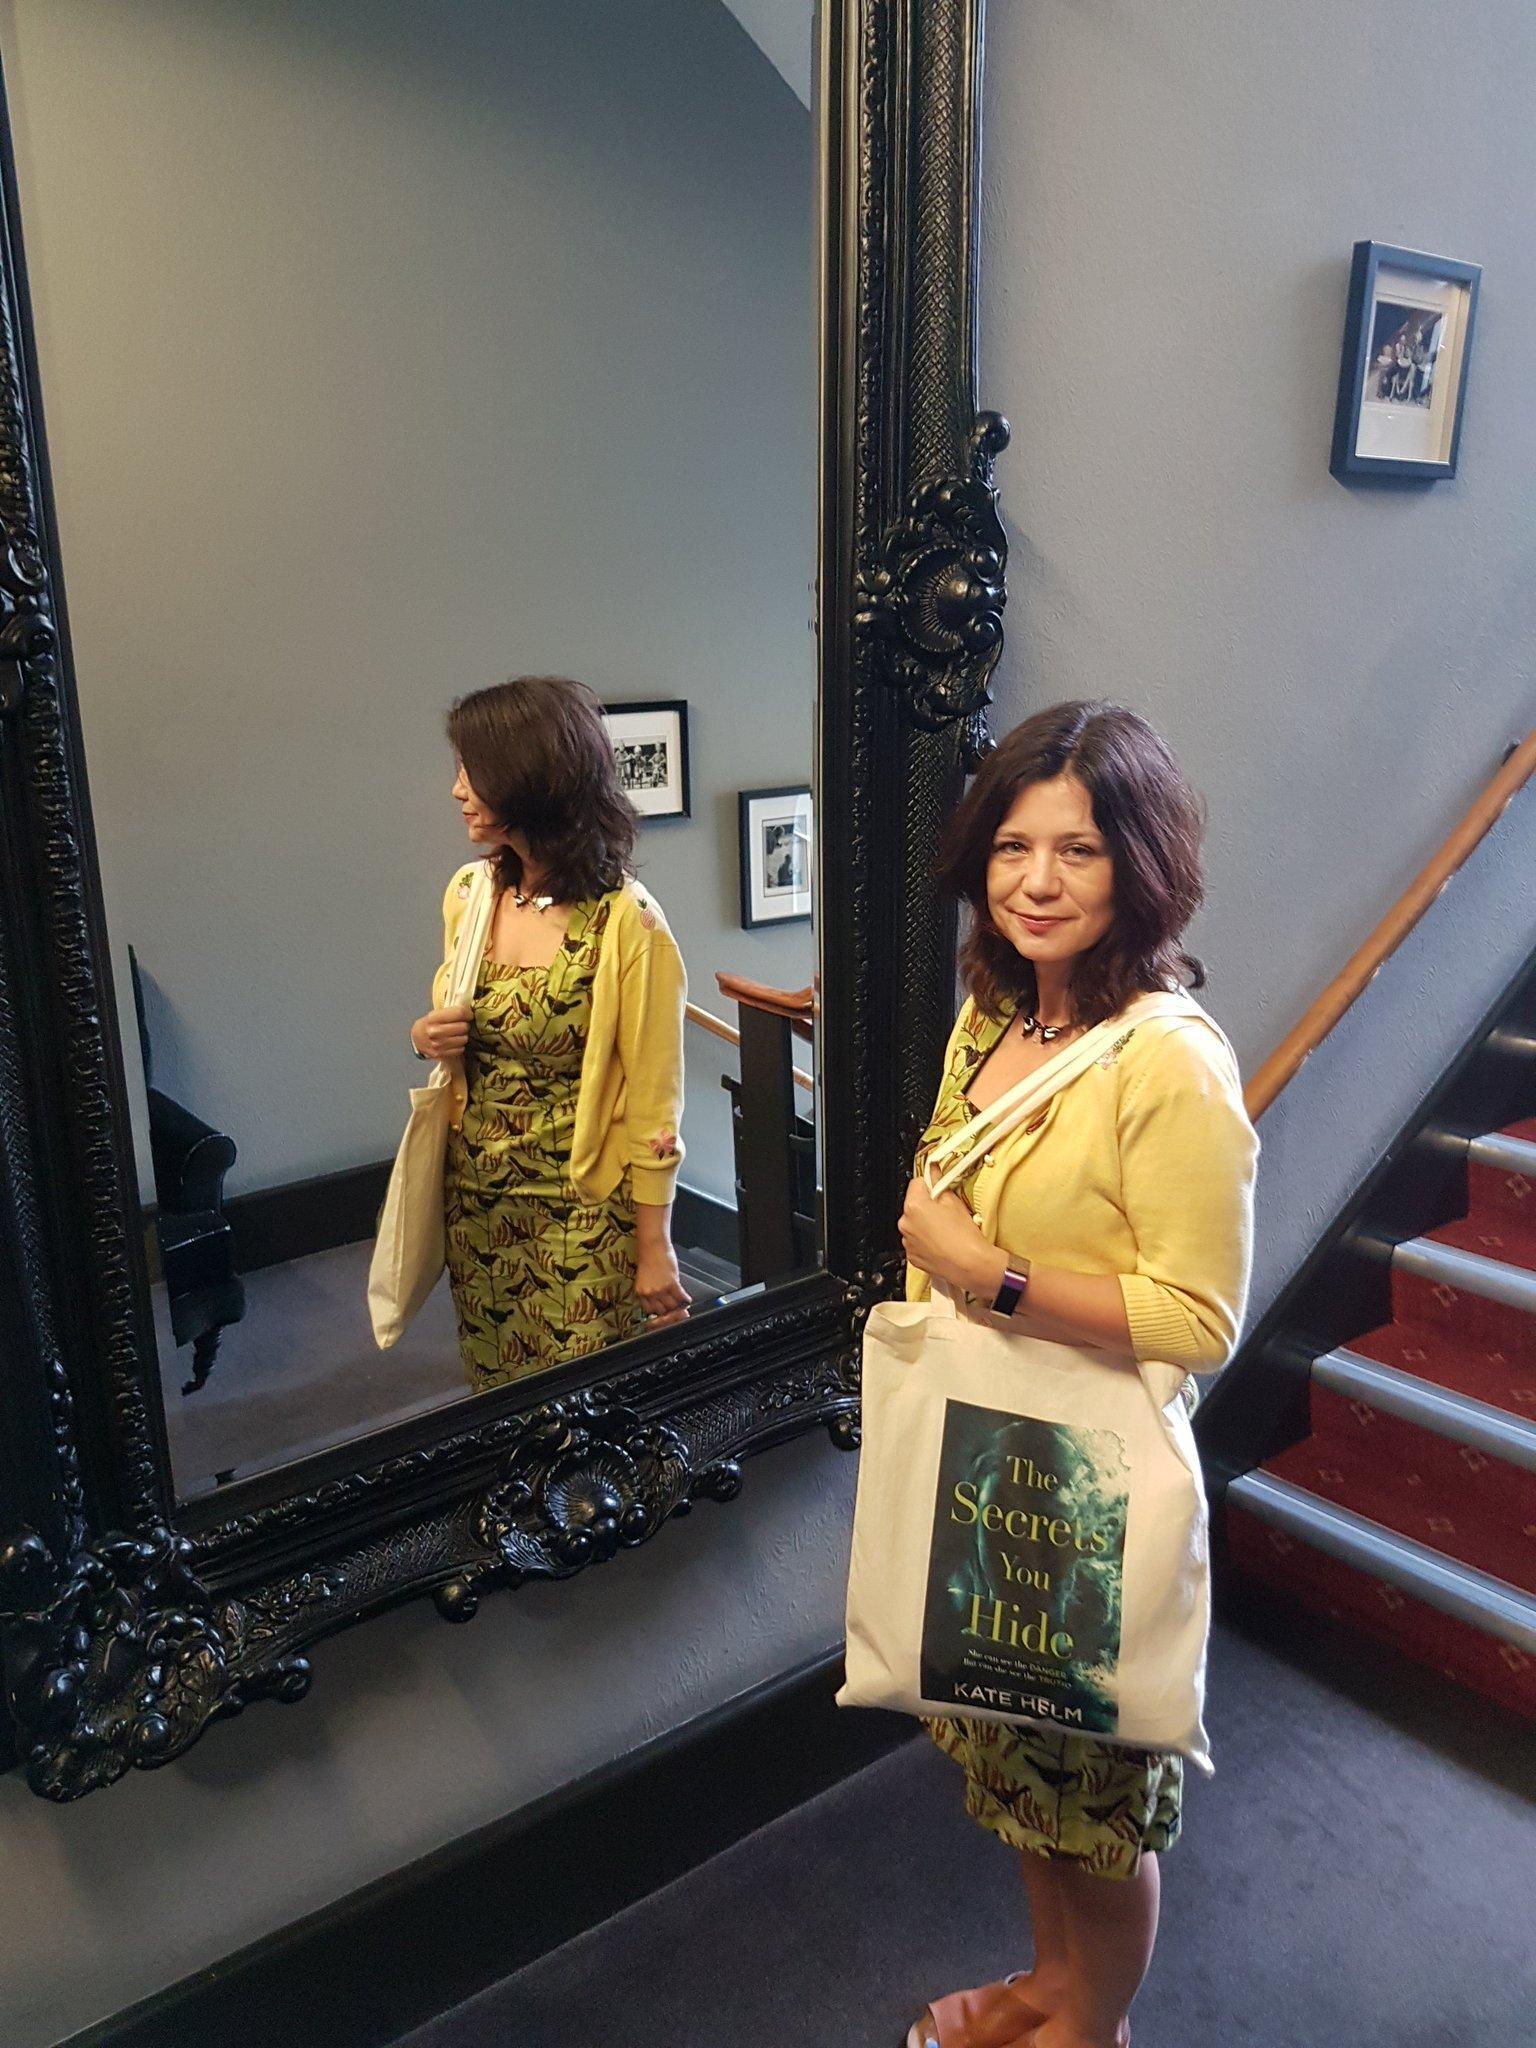 Me-with-my-tote-bag-harrogate.jpg (Copy) (Copy) (Copy)